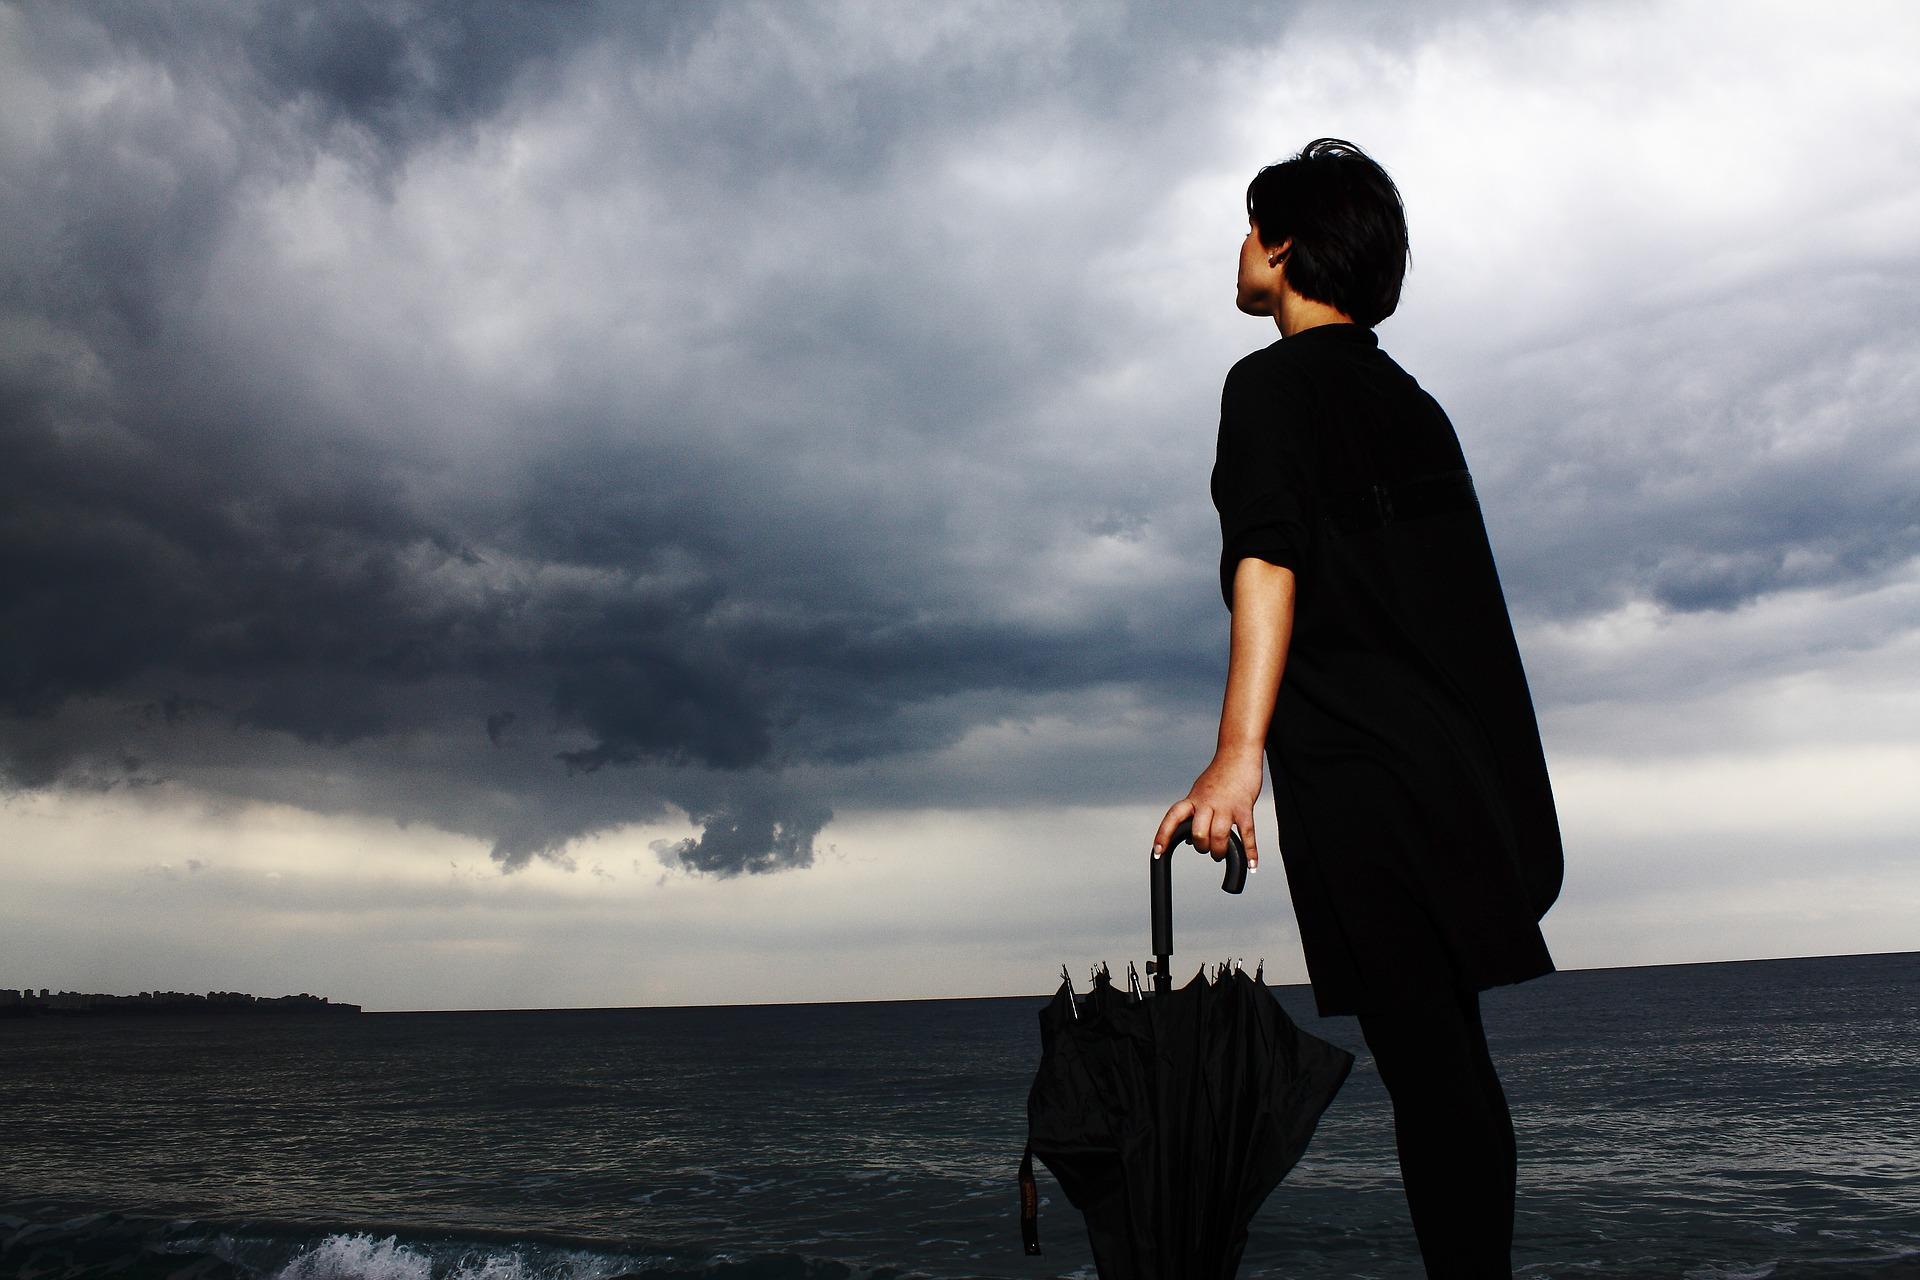 umbrella-2603995_1920.jpg